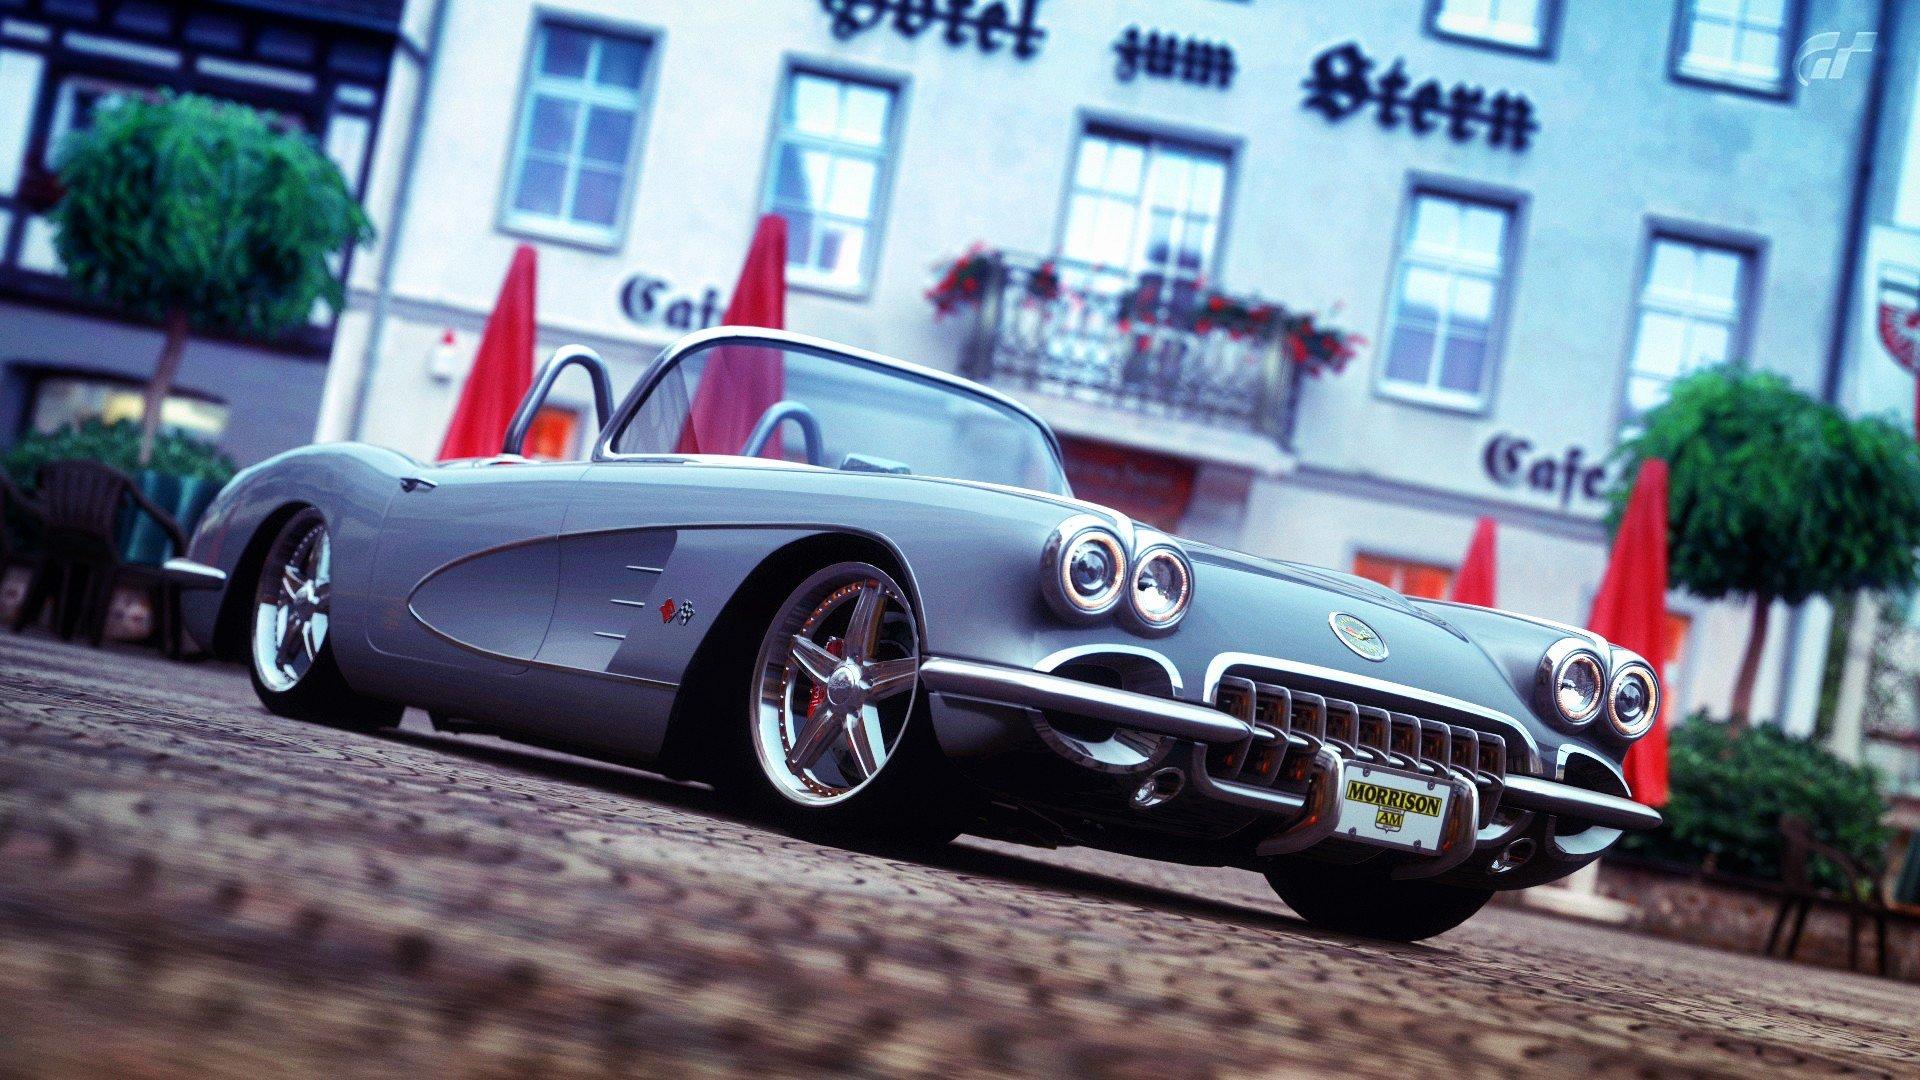 Chevrolet Corvette Hd Wallpaper Background Image 1920x1080 Id